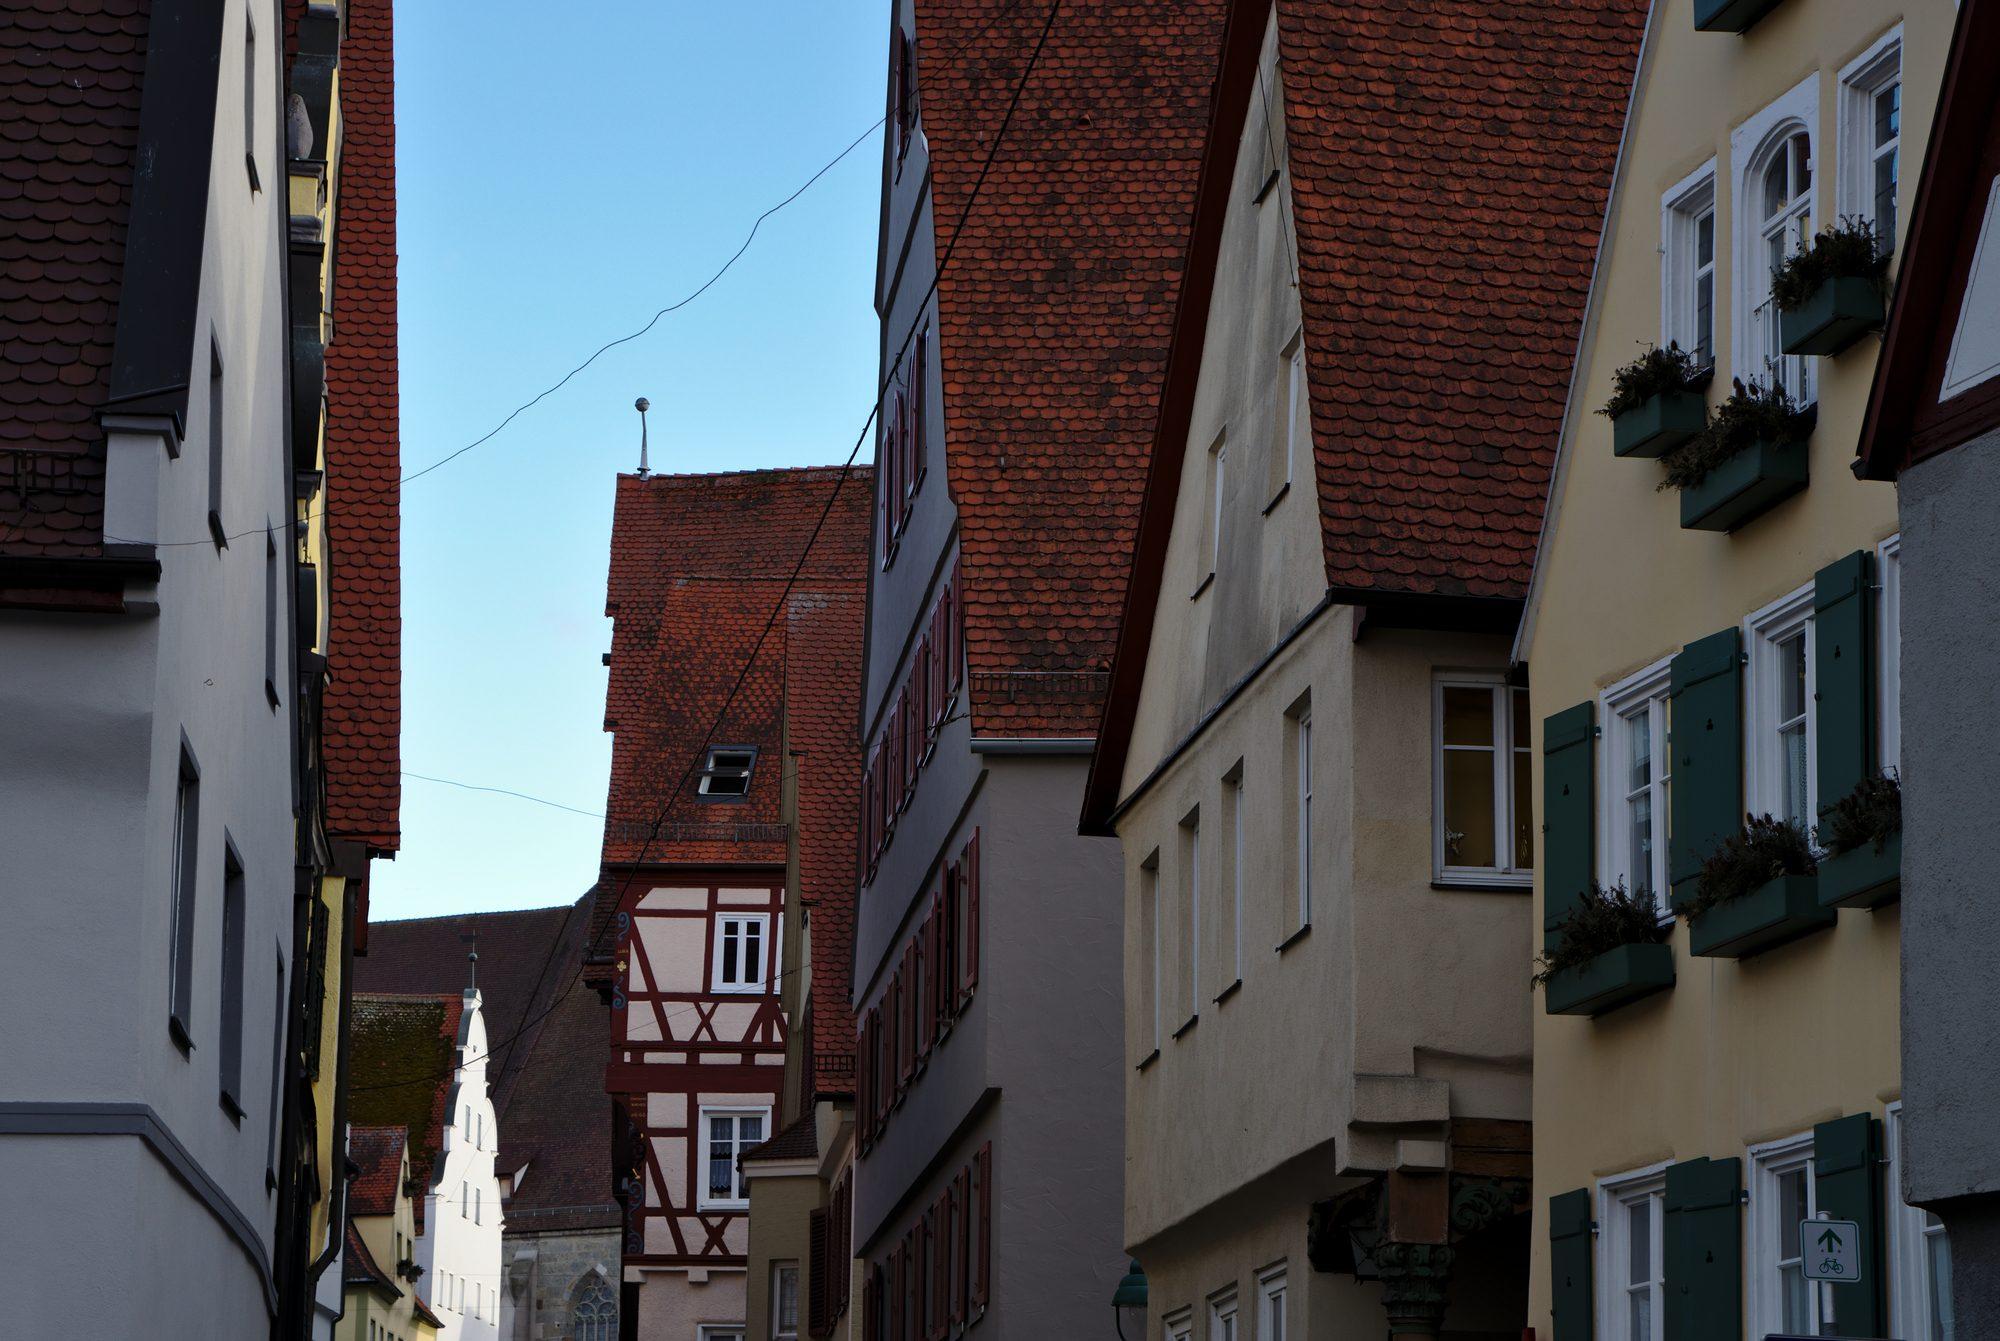 Gasse in Nördlingen